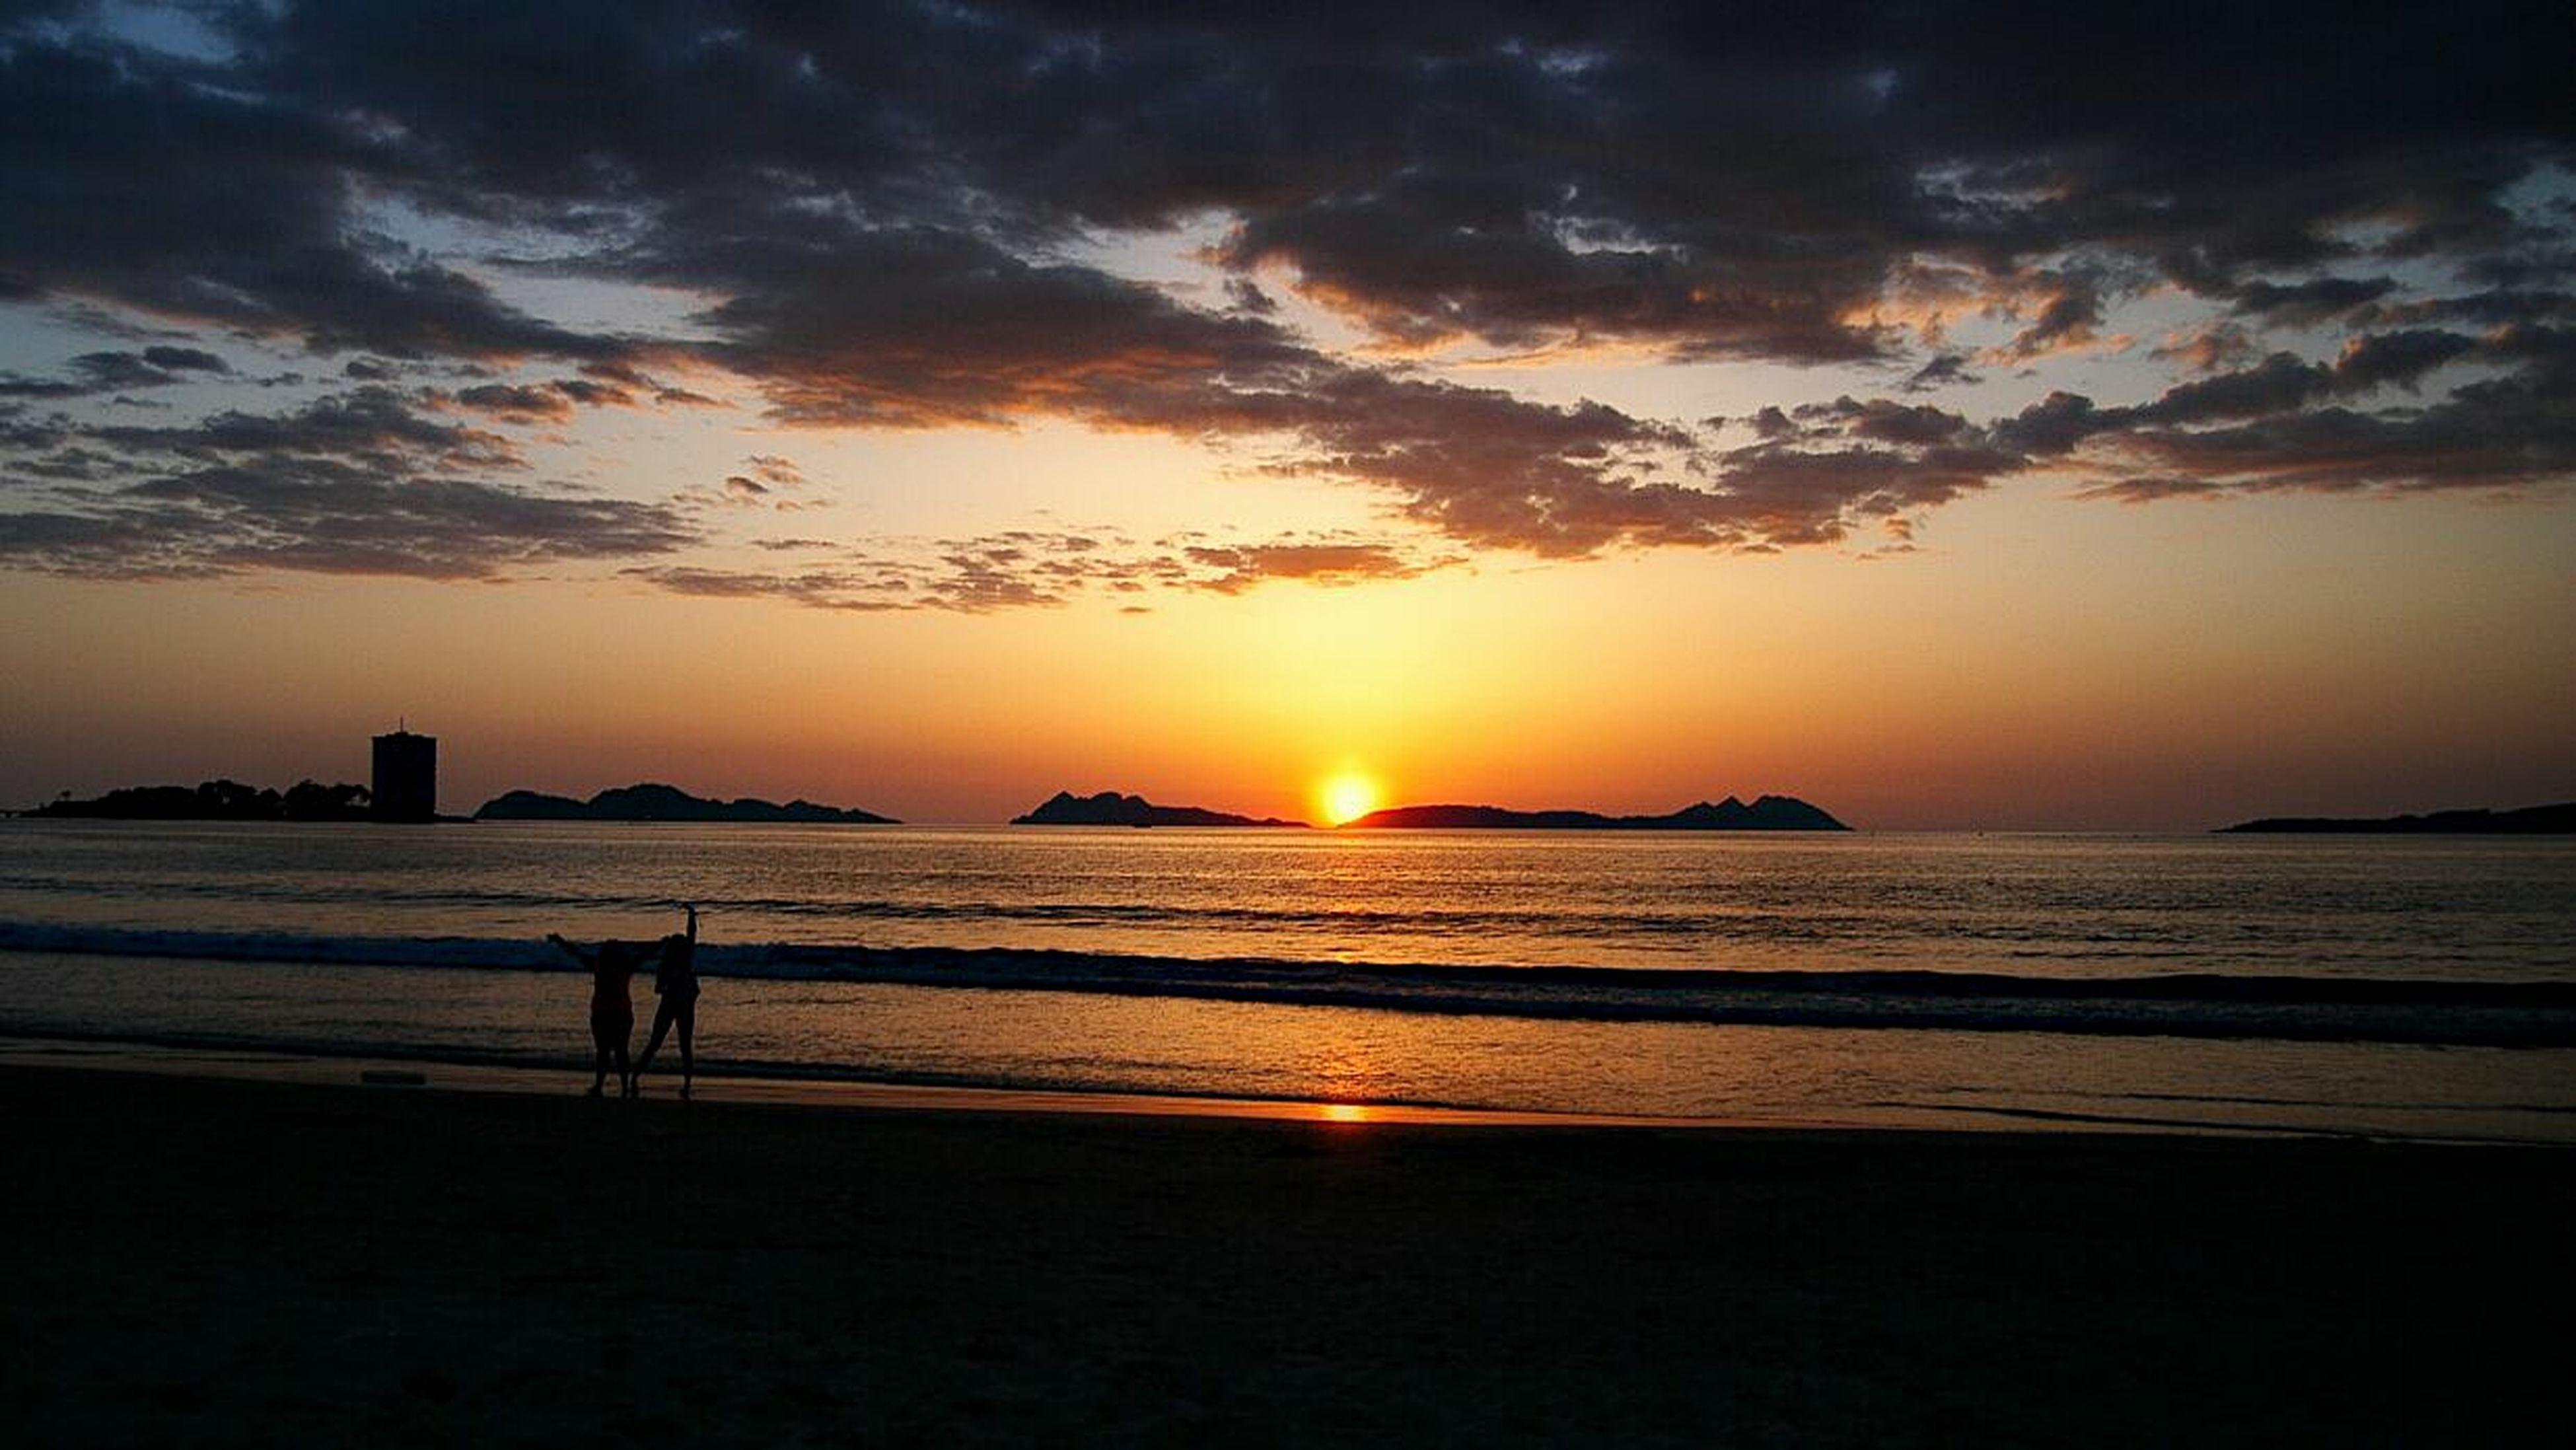 sunset, sea, horizon over water, beach, water, sun, scenics, sky, silhouette, shore, orange color, beauty in nature, tranquil scene, tranquility, idyllic, cloud - sky, nature, reflection, sunlight, cloud